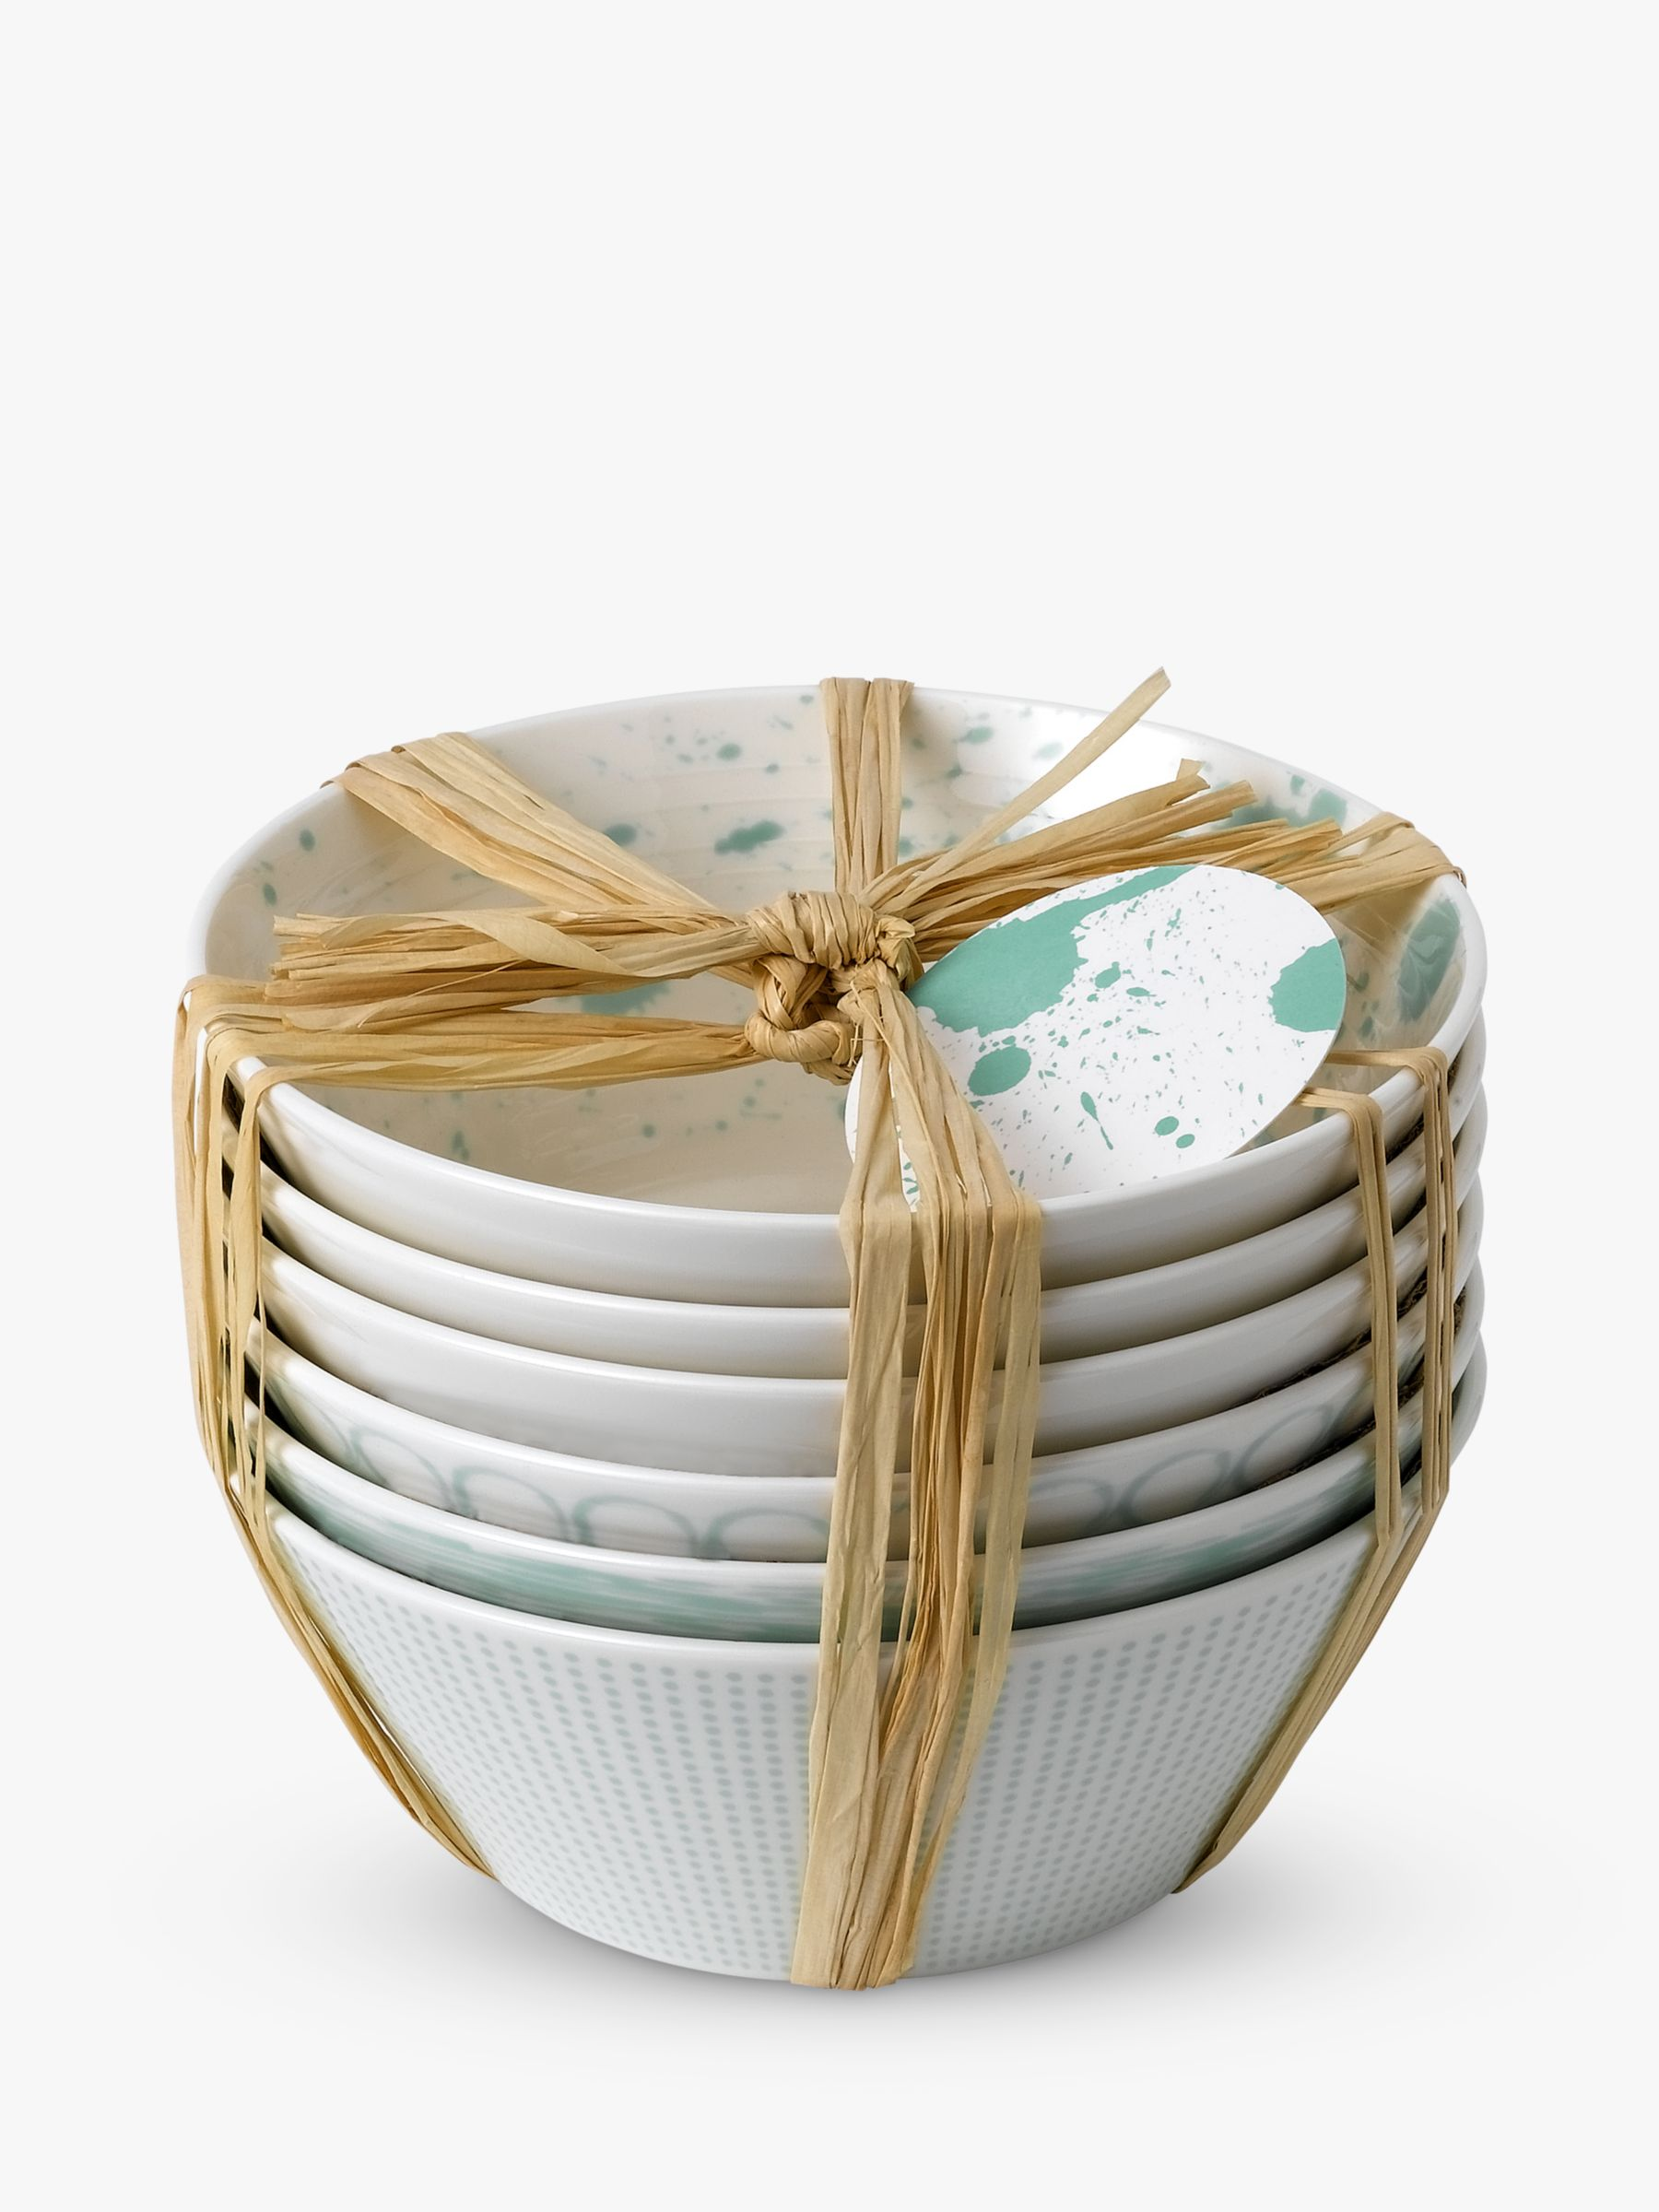 Royal Doulton Royal Doulton Pacific Porcelain Bowls, Set of 6, 16cm